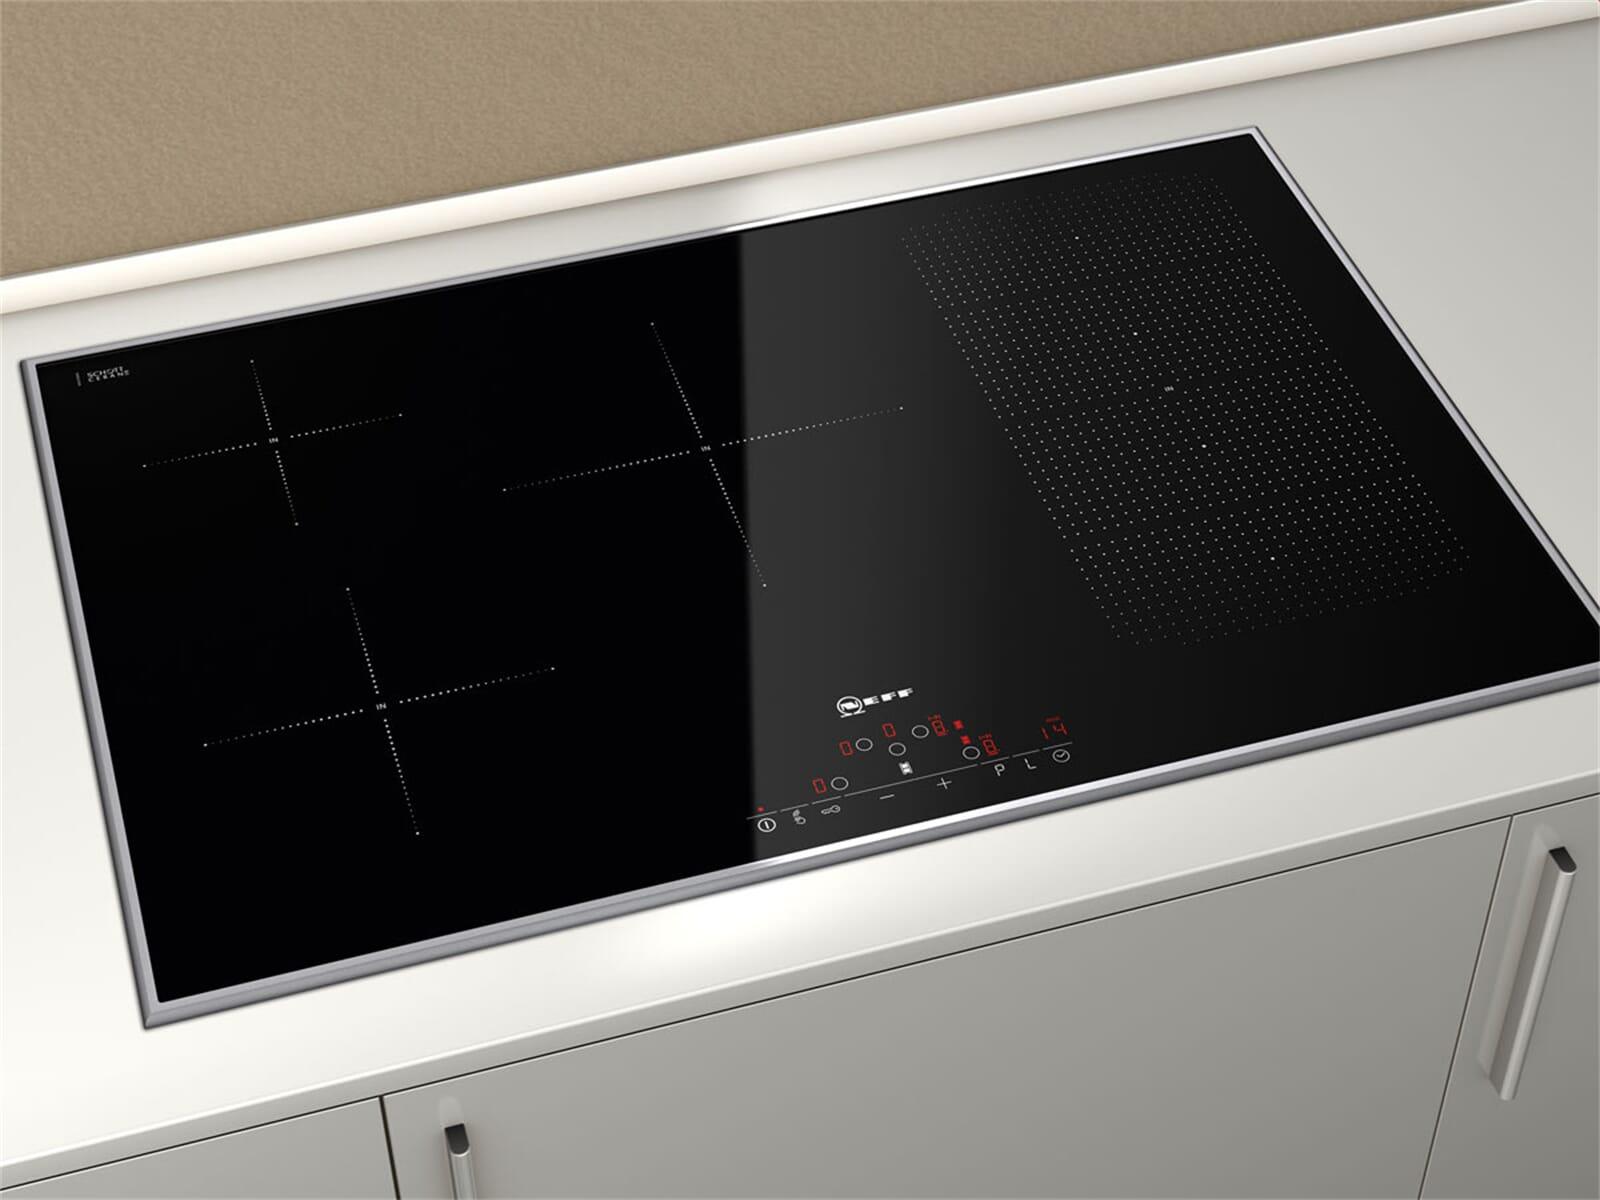 neff td 5386 n induktion glaskeramik kochfeld autark ebay. Black Bedroom Furniture Sets. Home Design Ideas